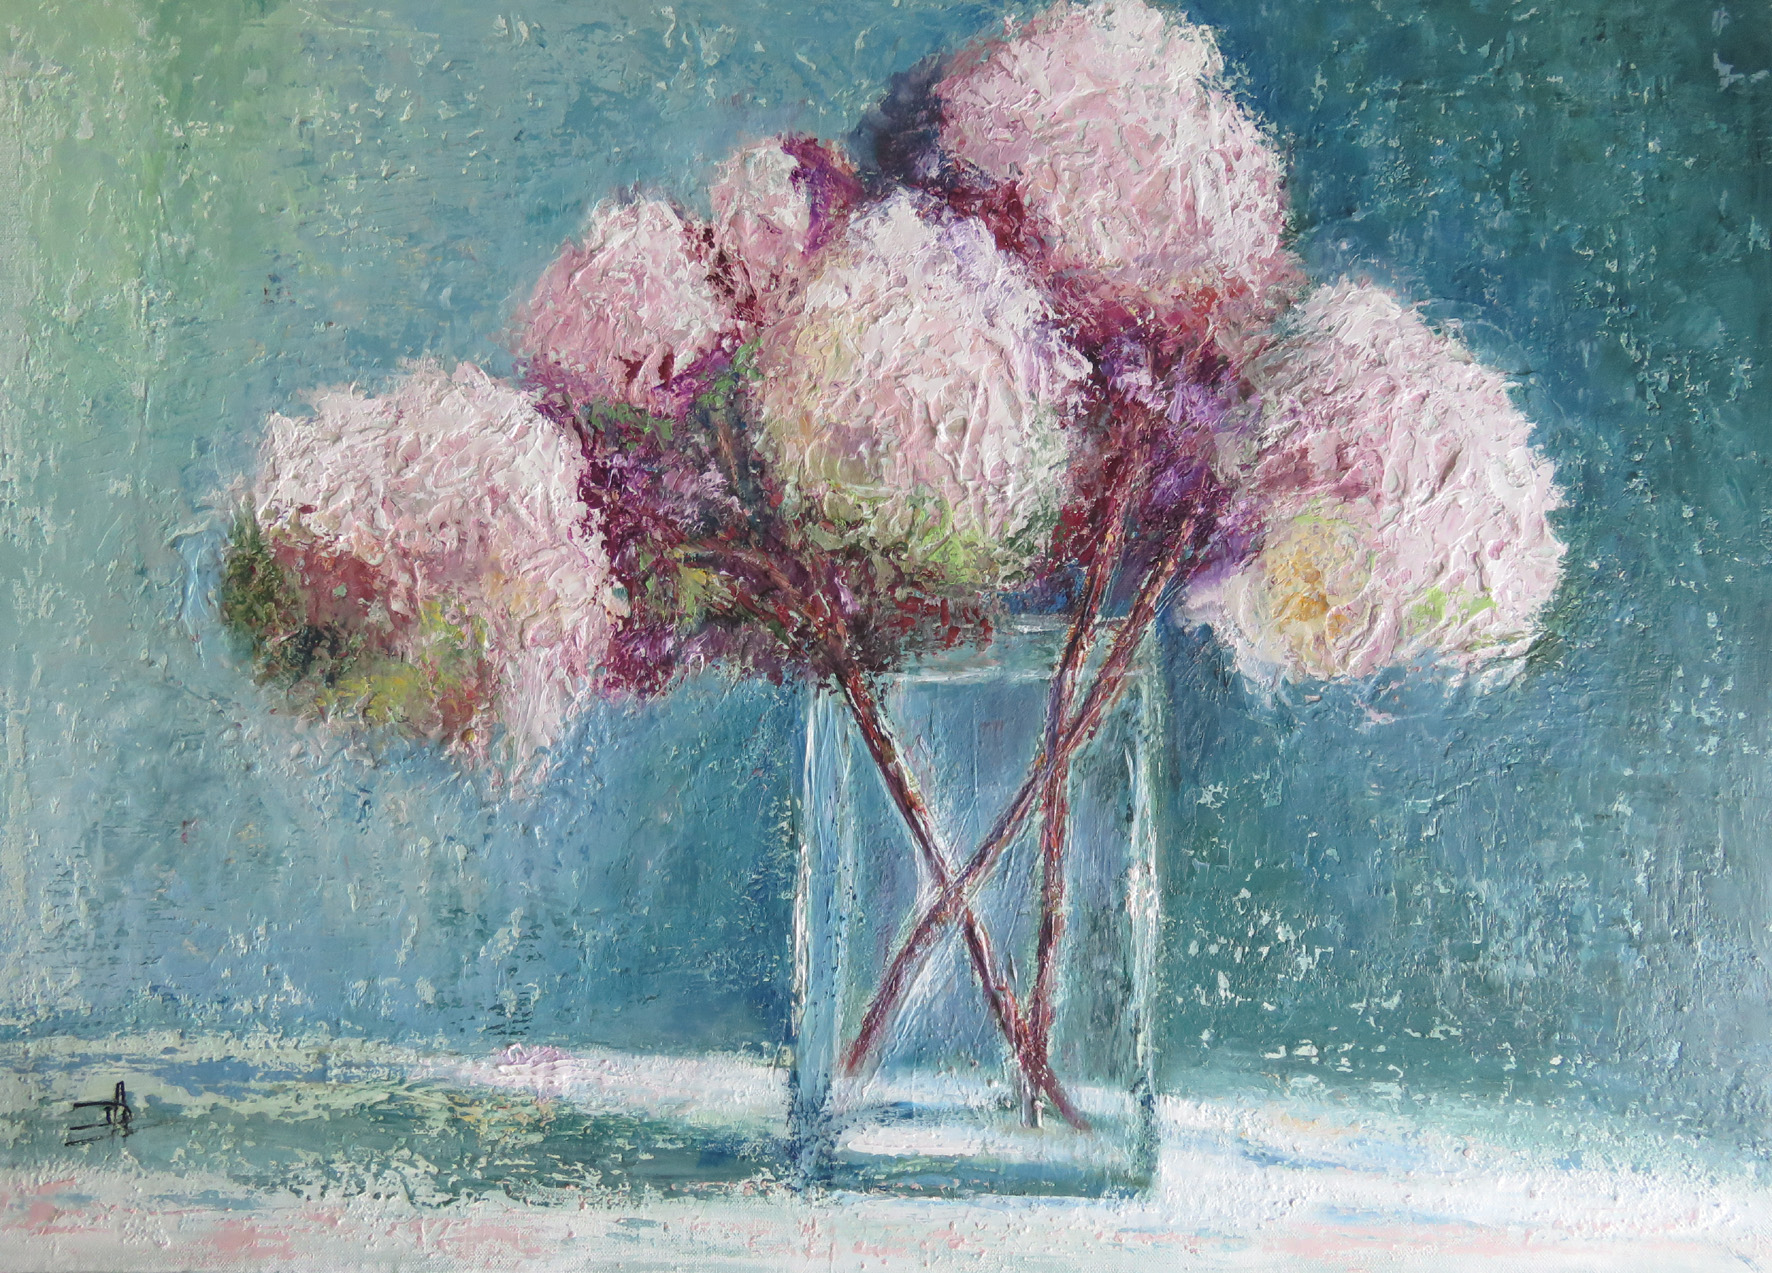 Abstr floral 2021